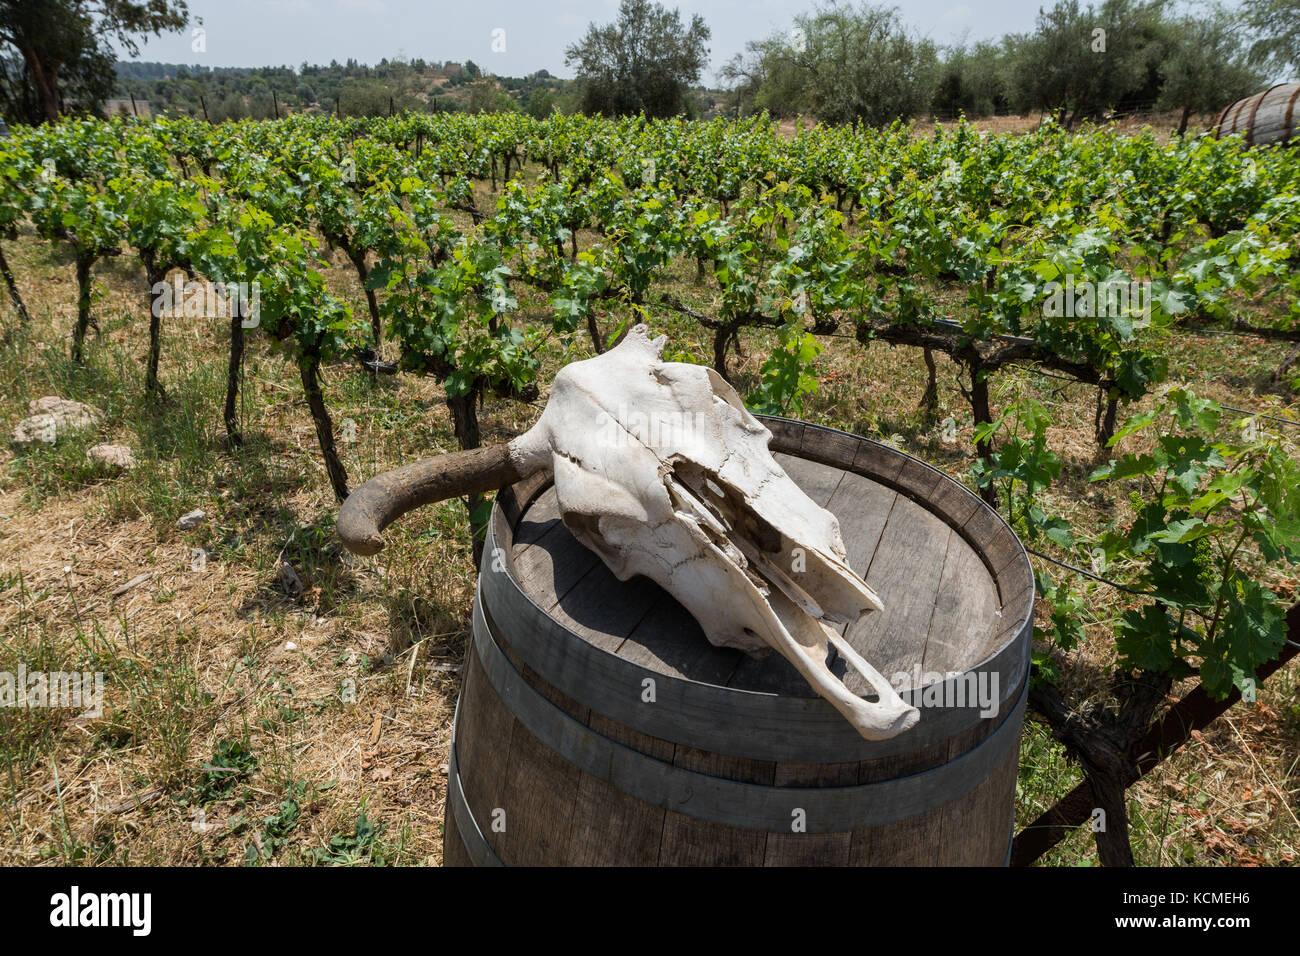 vines of Agur winery, Agur,.Israel Stock Photo